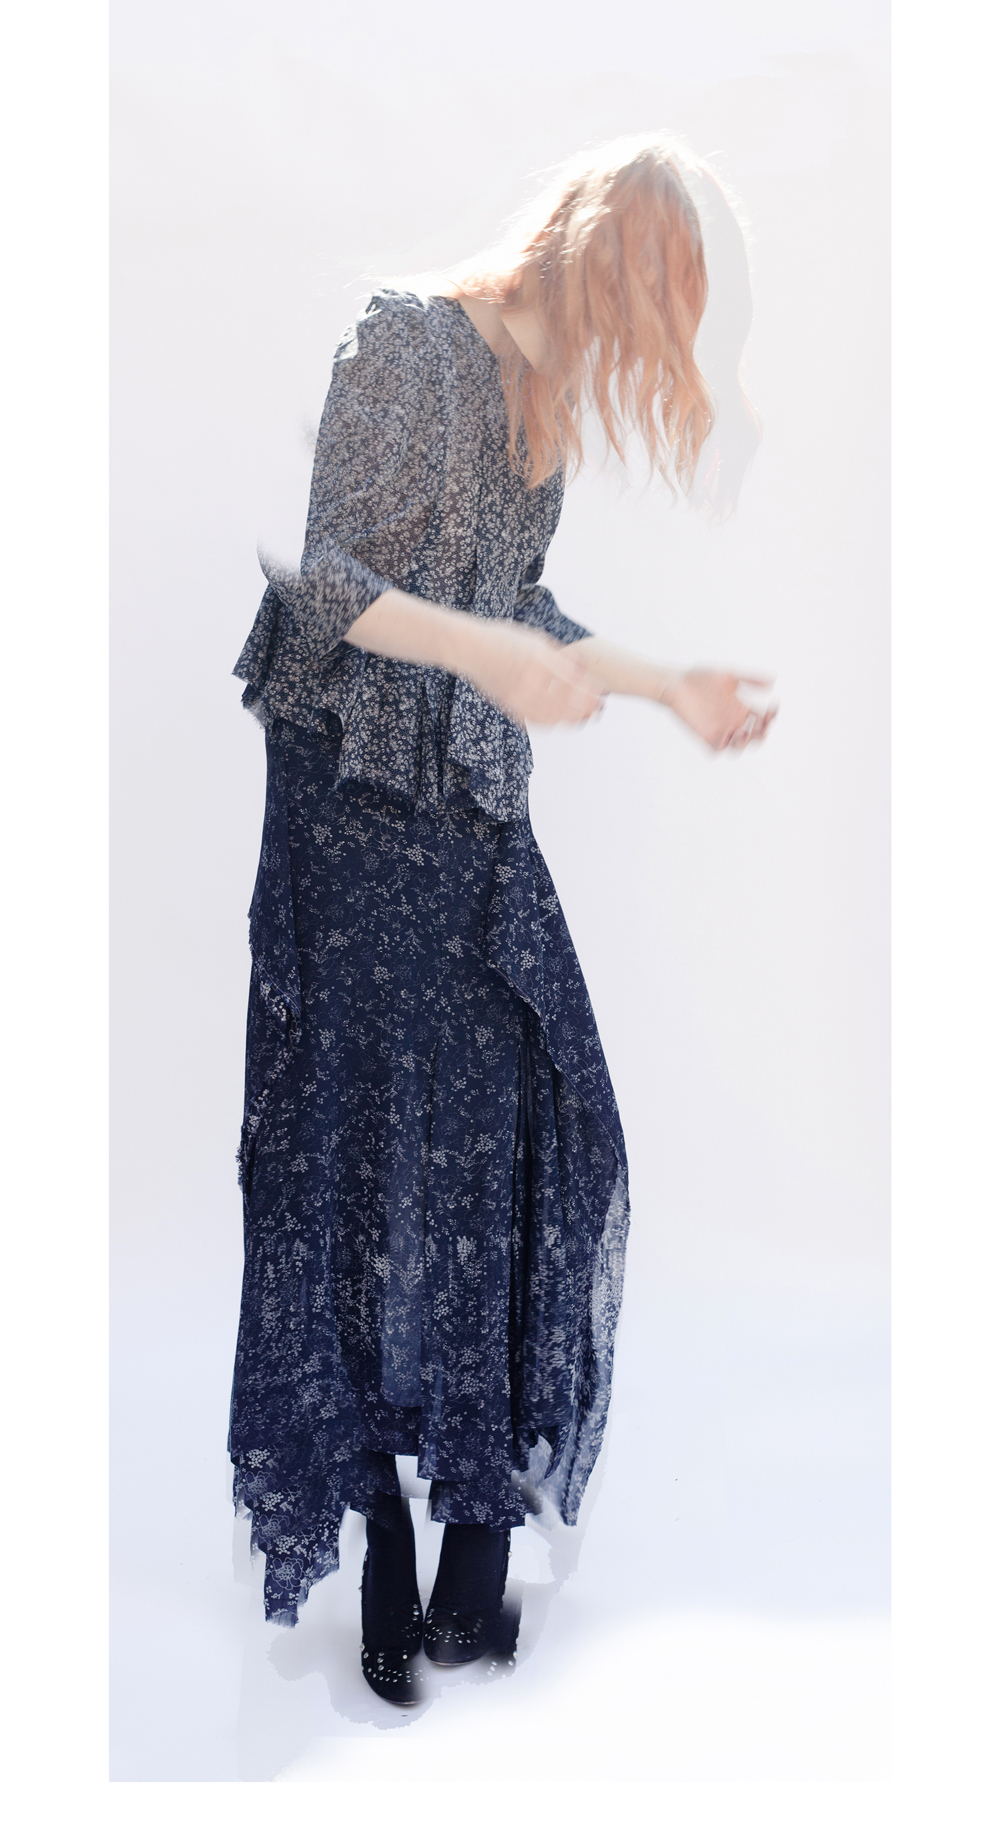 DRESS-ltd NAVY PRINT REMNANT Broken Dress Jacket & Inside Out Emerging Skirt, worn sleeveless